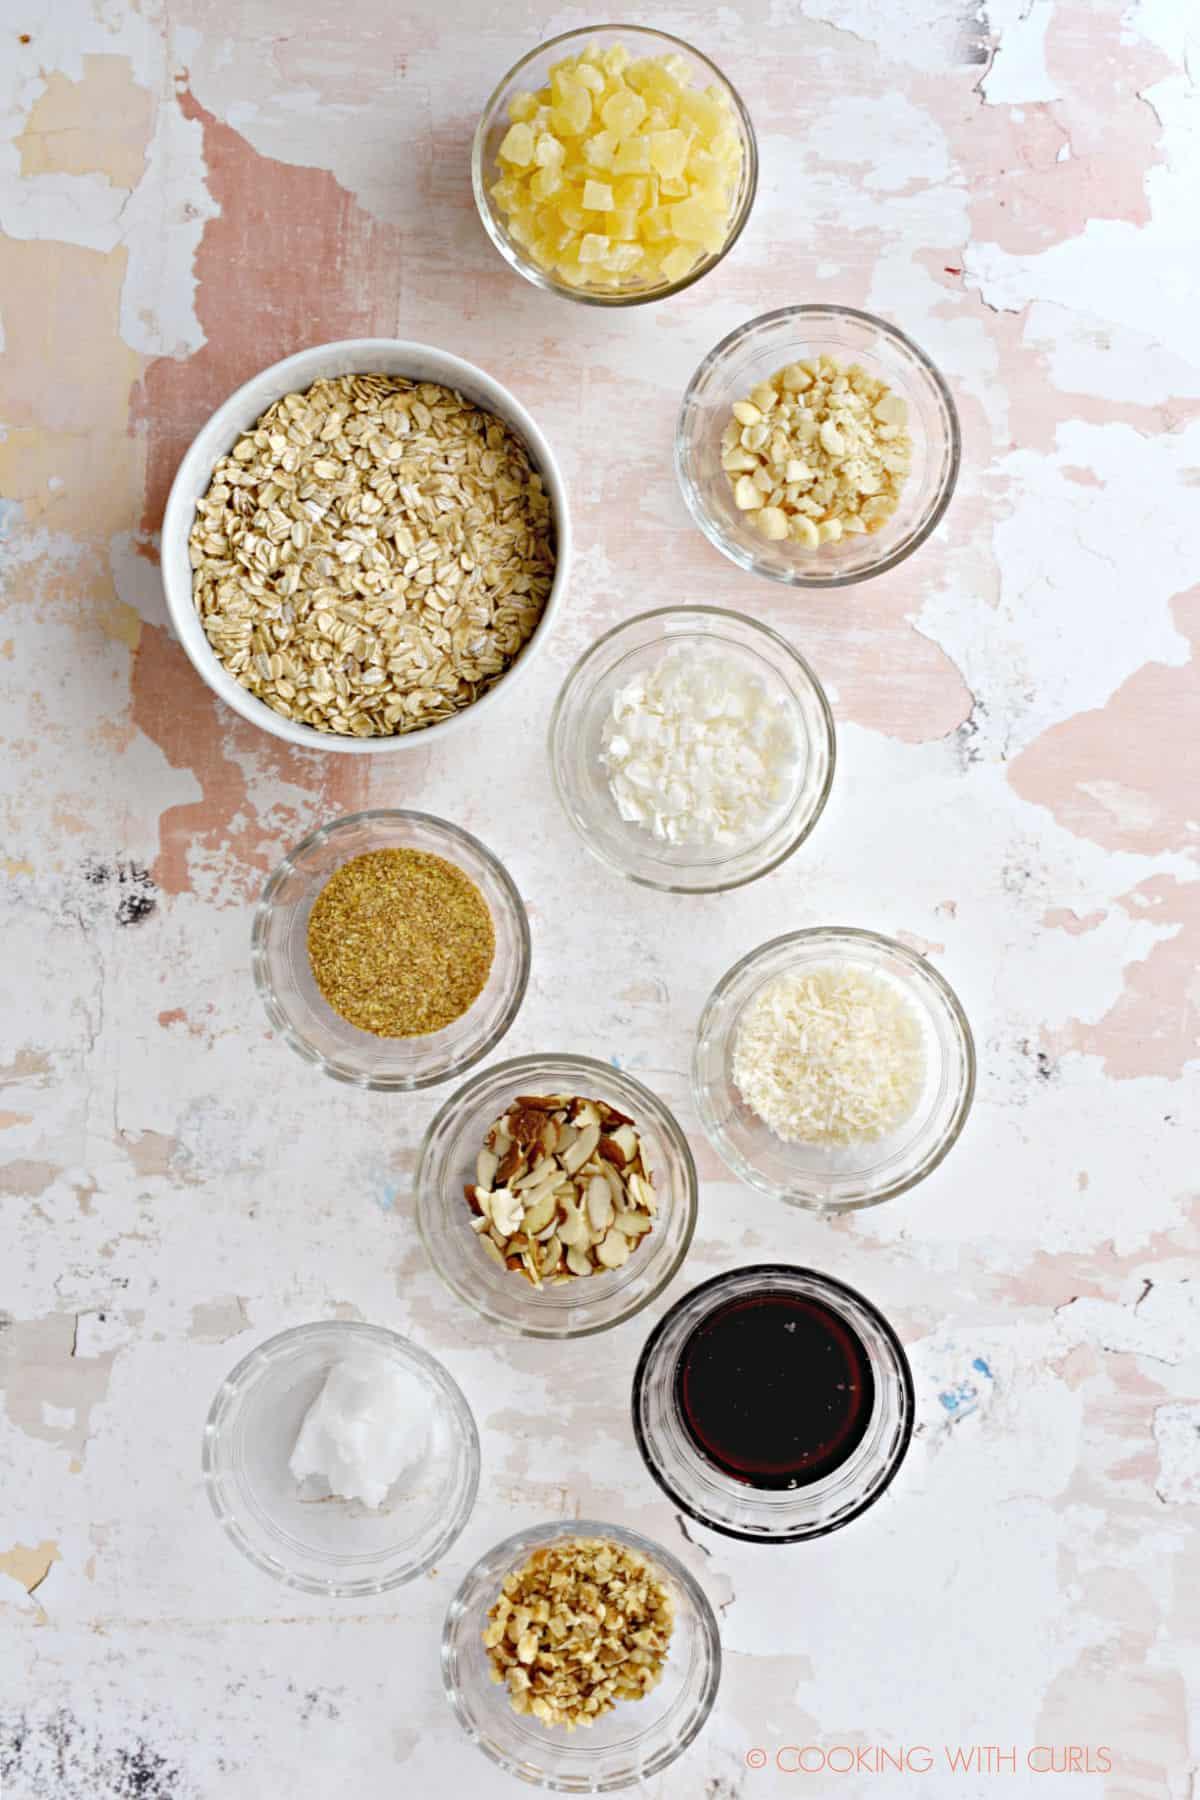 Pina Colada Granola ingredients in separate bowls.